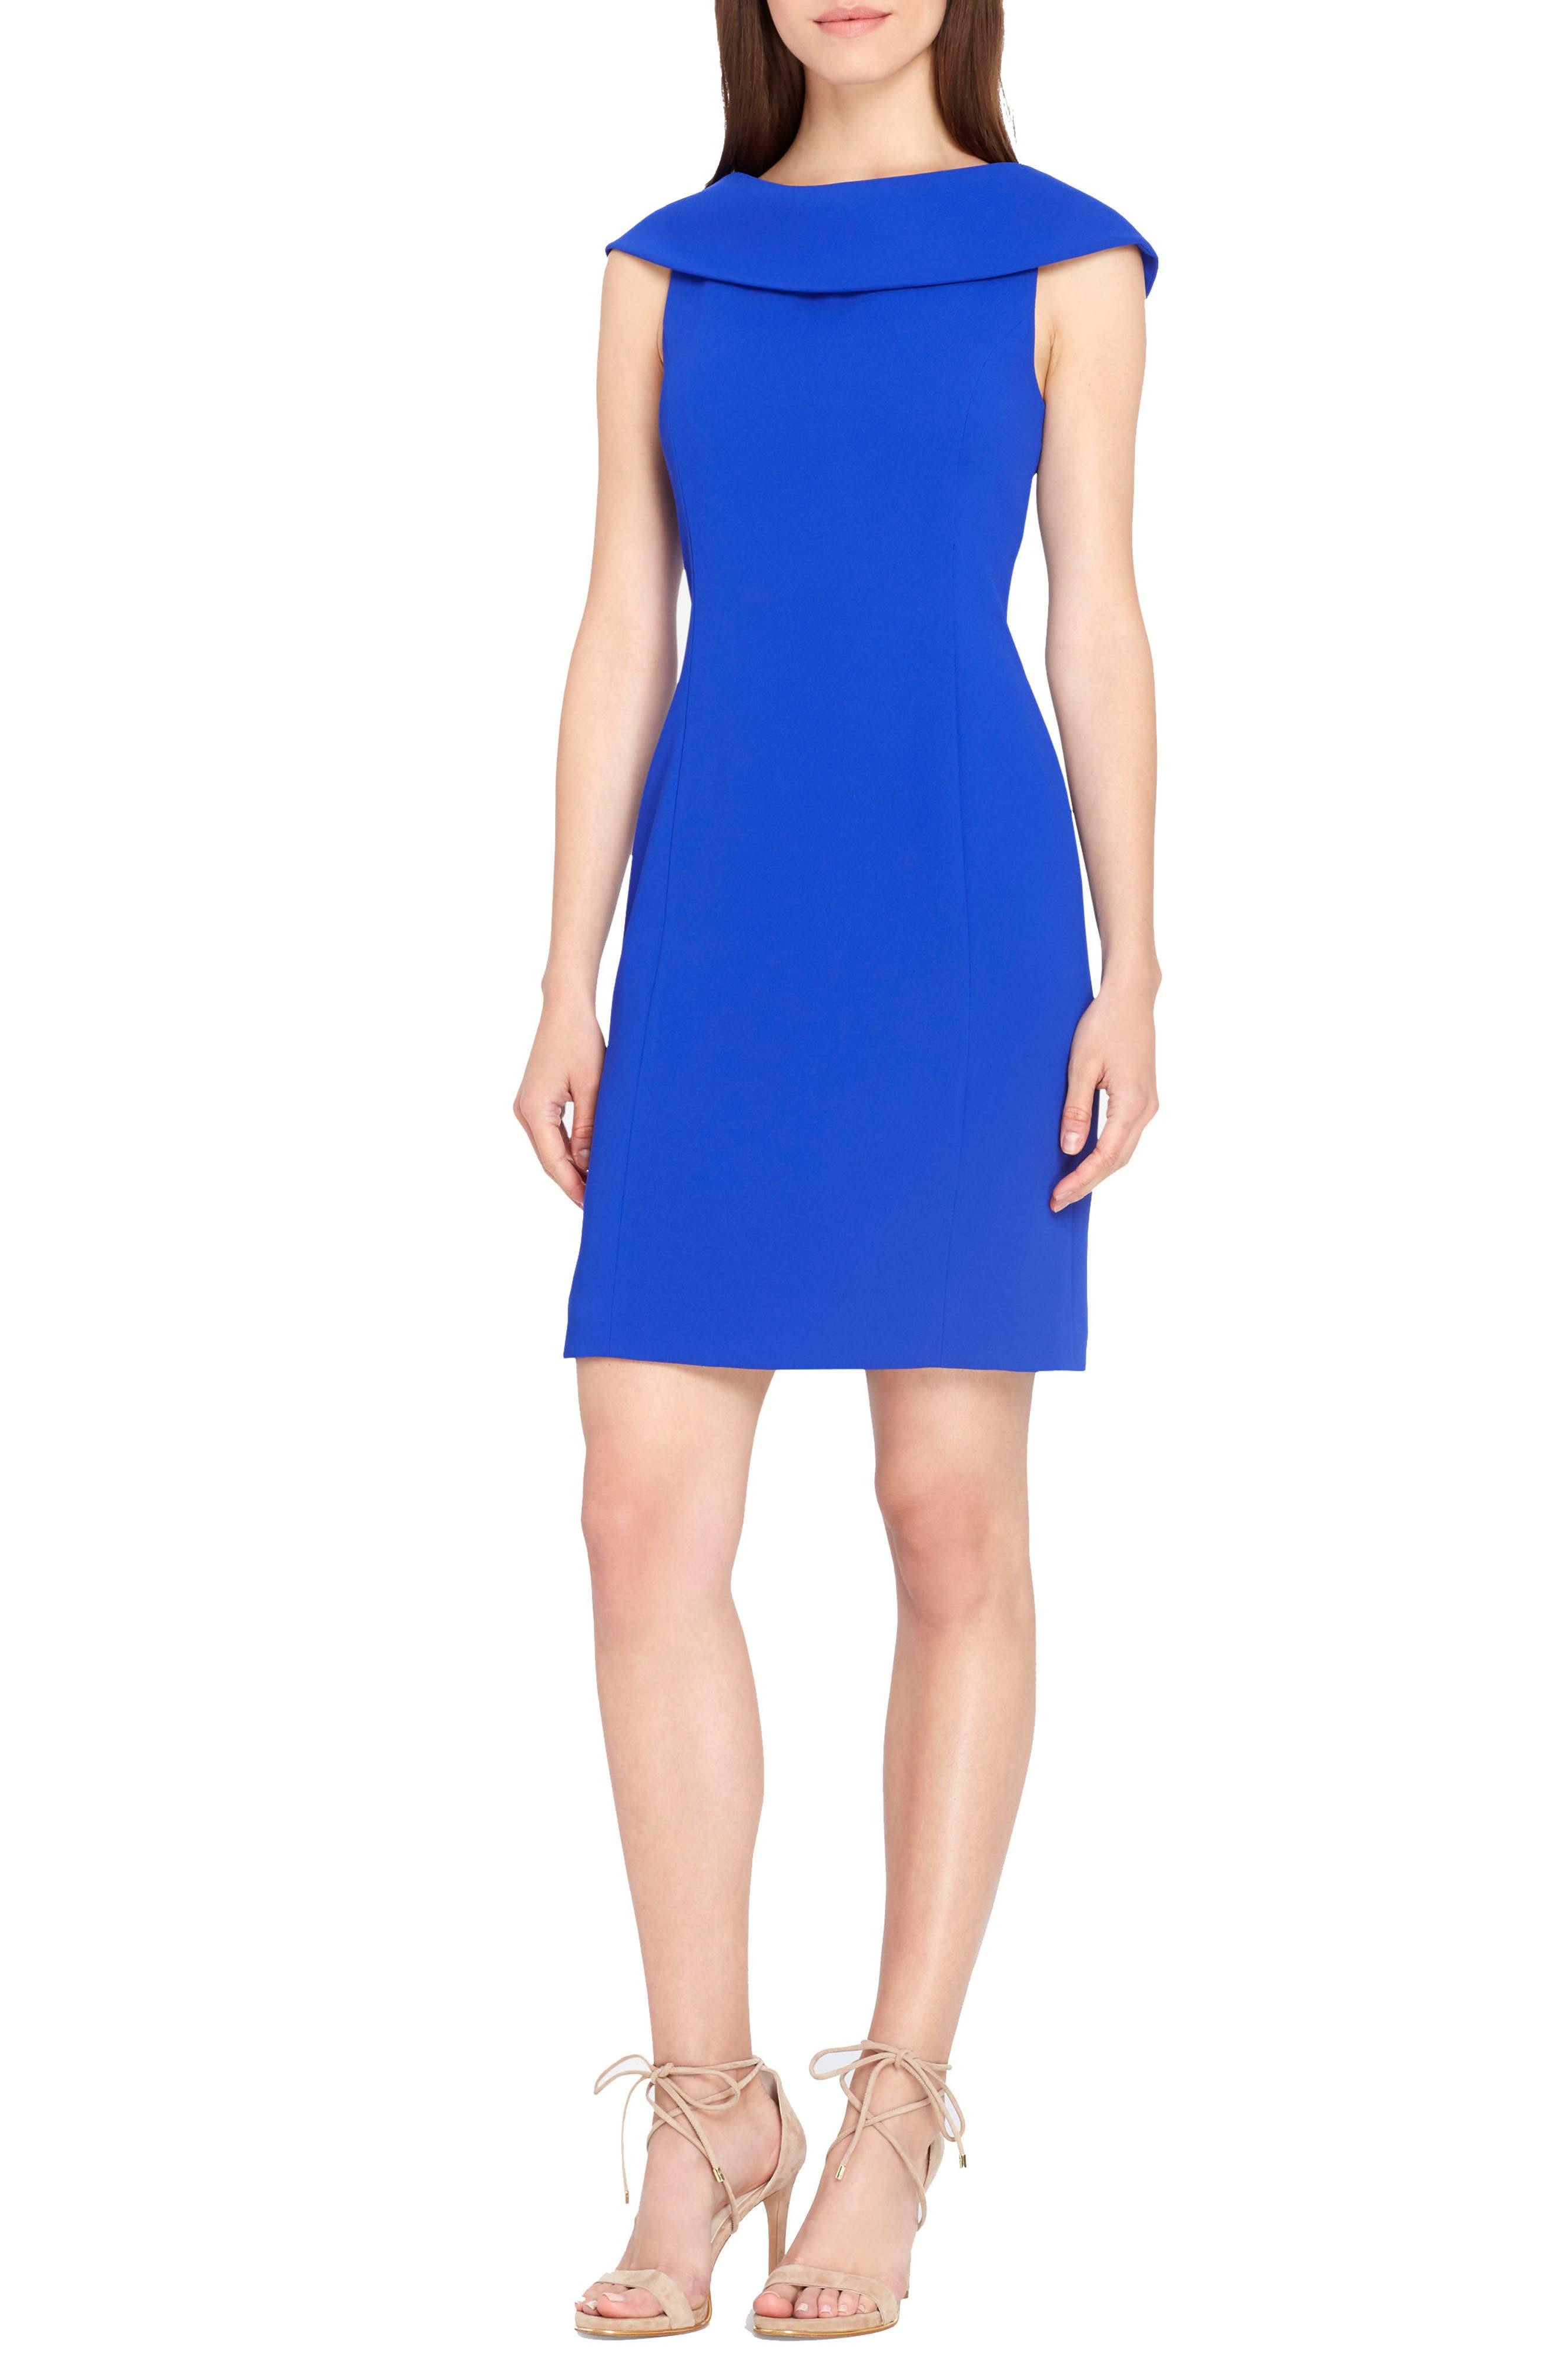 Alternate Image 1 Selected - Tahari Roll Neck Sheath Dress (Regular & Petite)